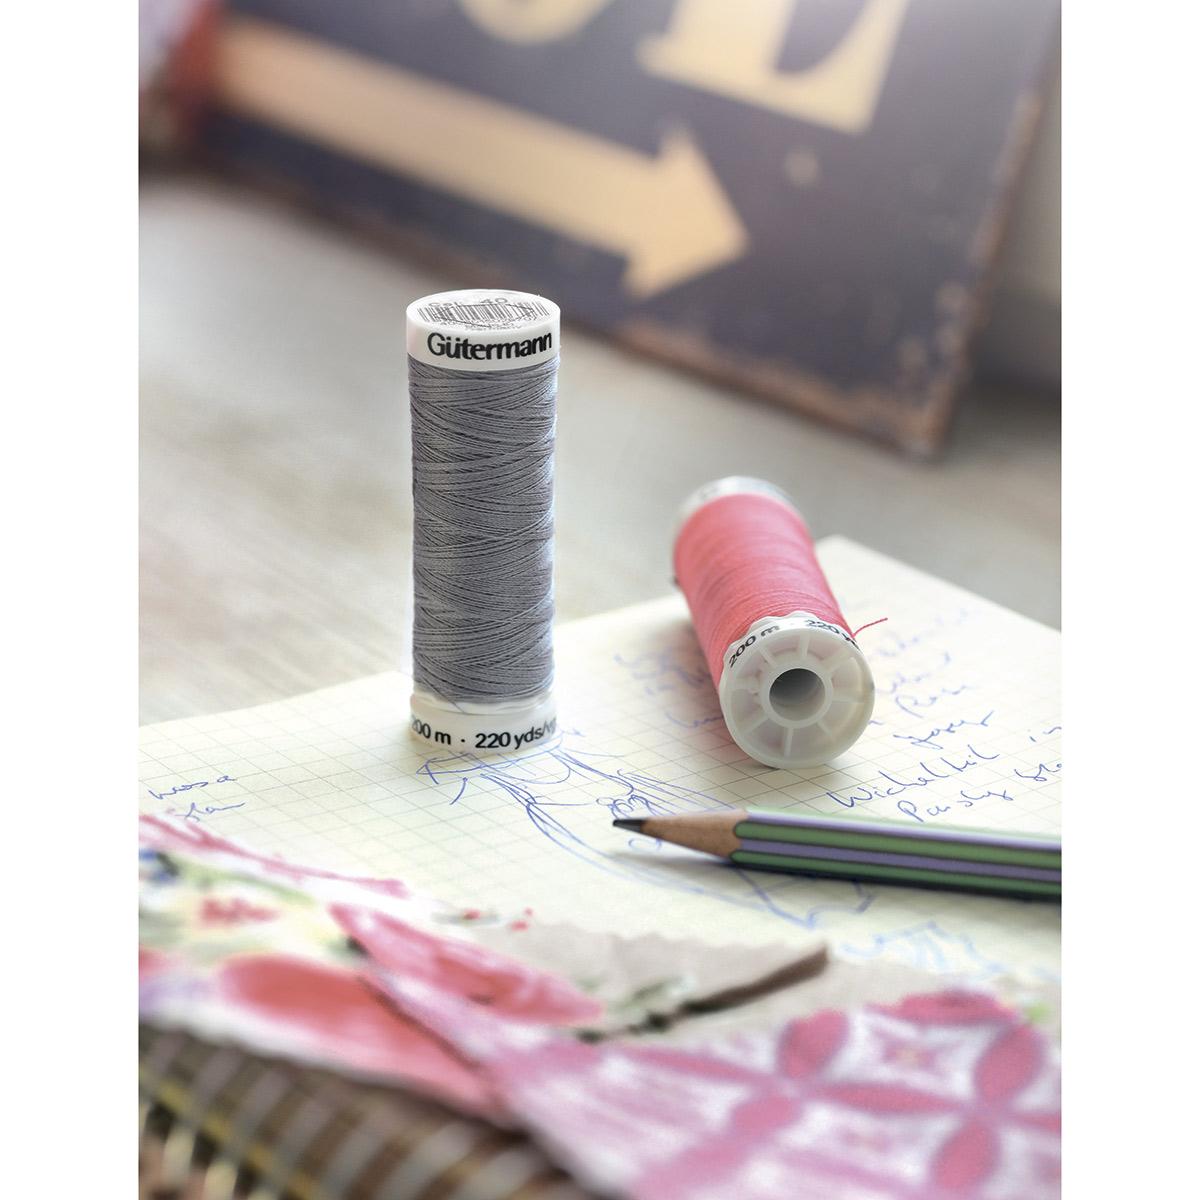 01 Нить Sew-all для всех материалов, 200м, 100% п/э Гутерманн 748277